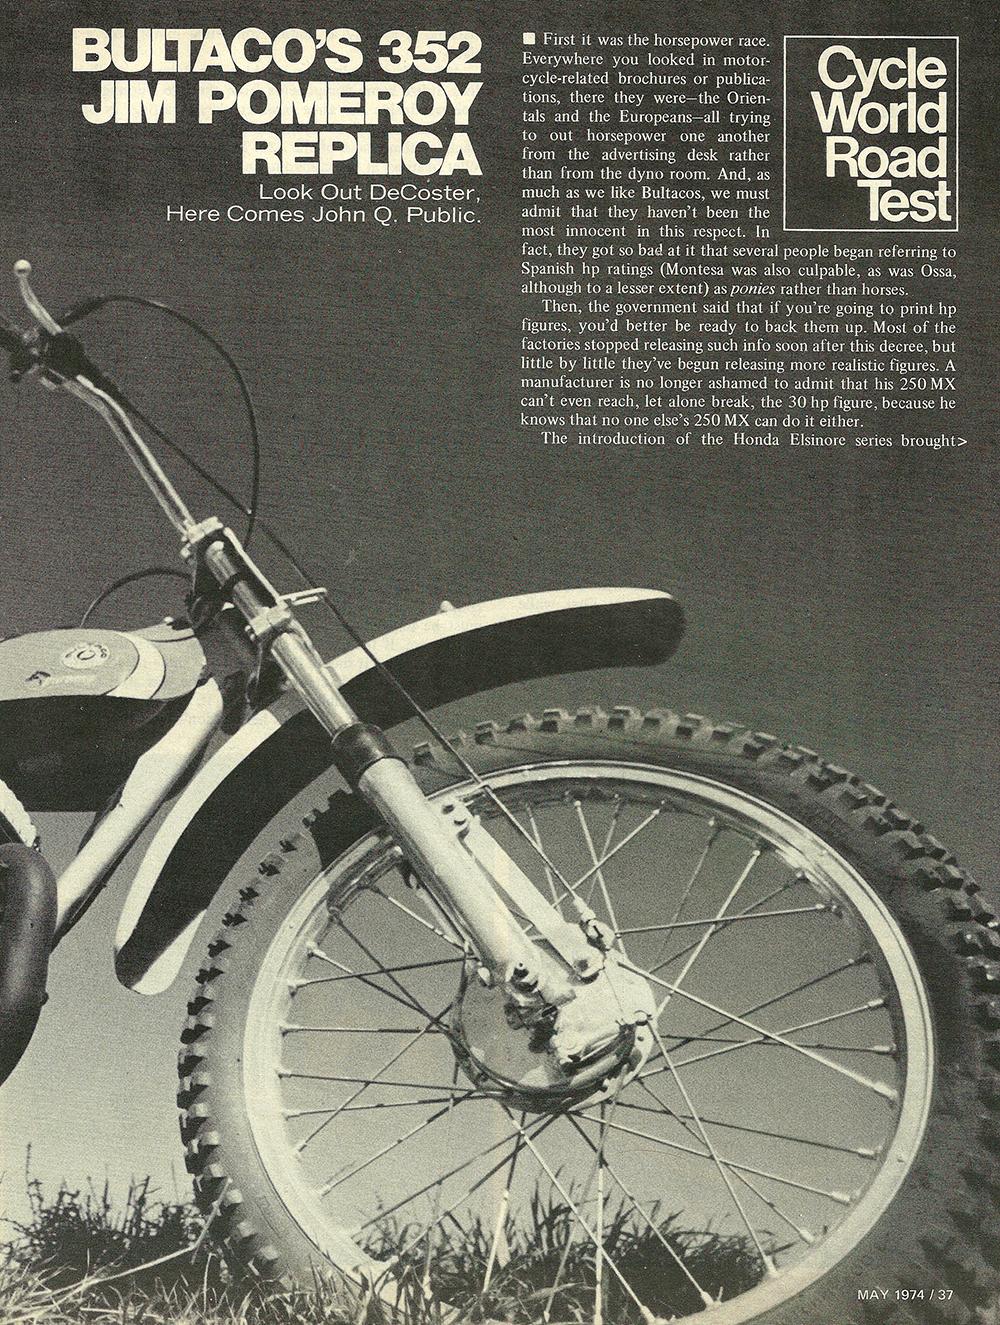 1974 Bultaco 352 Pomeroy road test 02.jpg